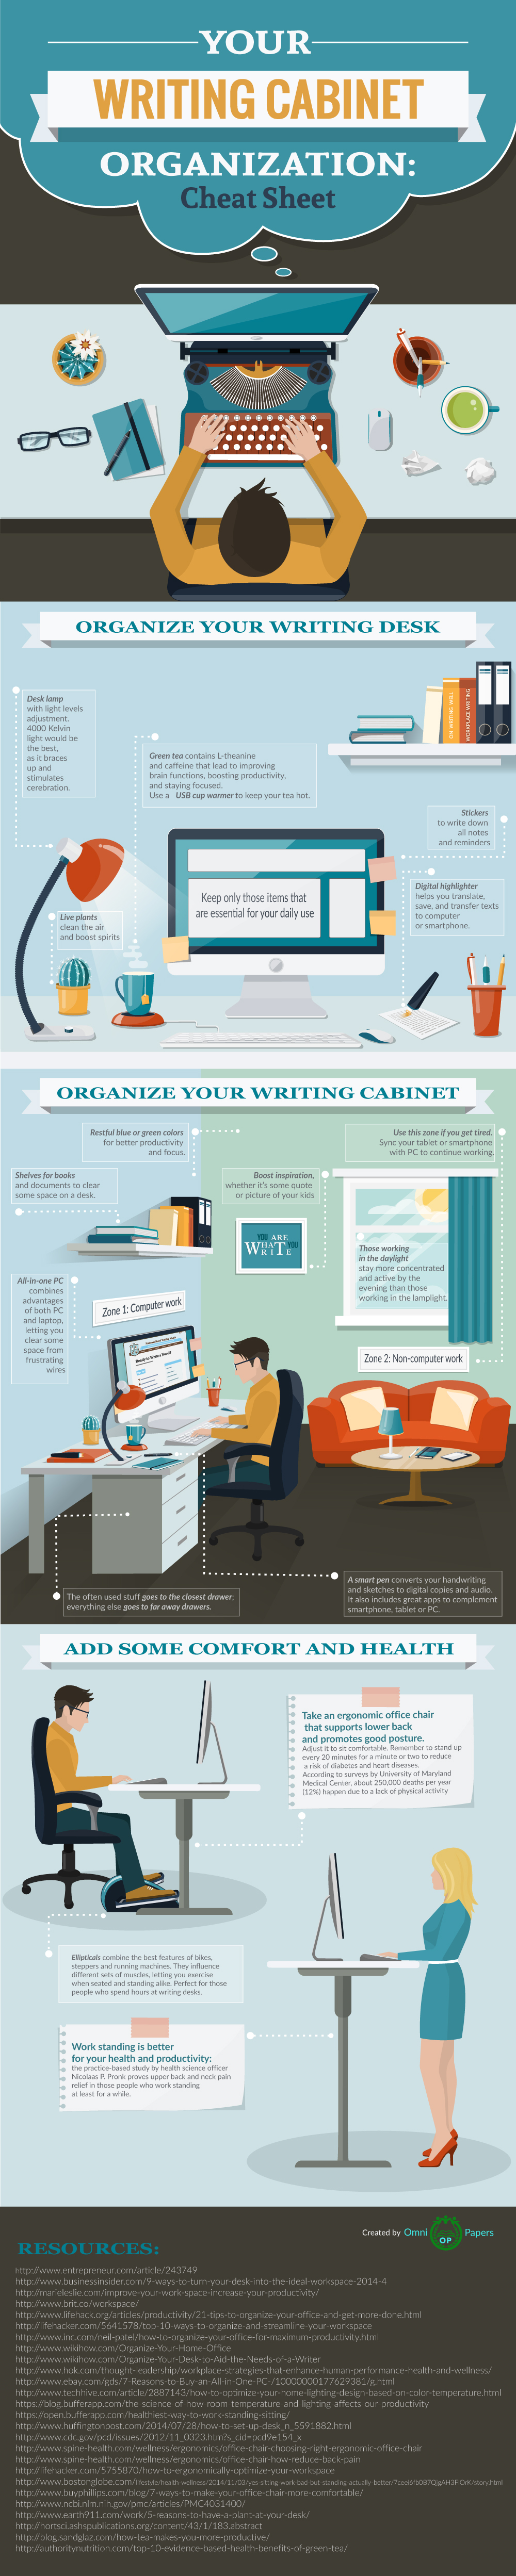 your writing cabinet organization.jpg